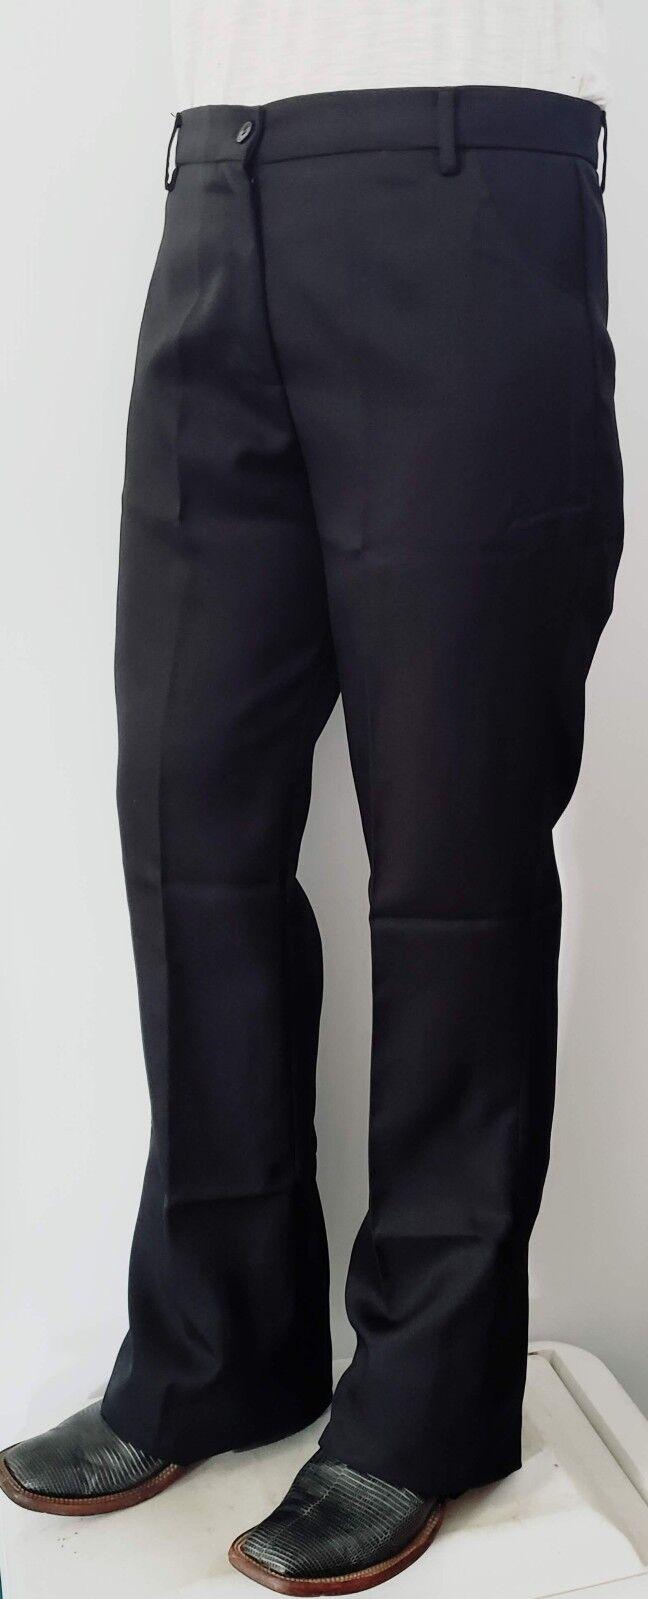 Mostrar Negro Pantalones Equine Western Adulto Xlarge